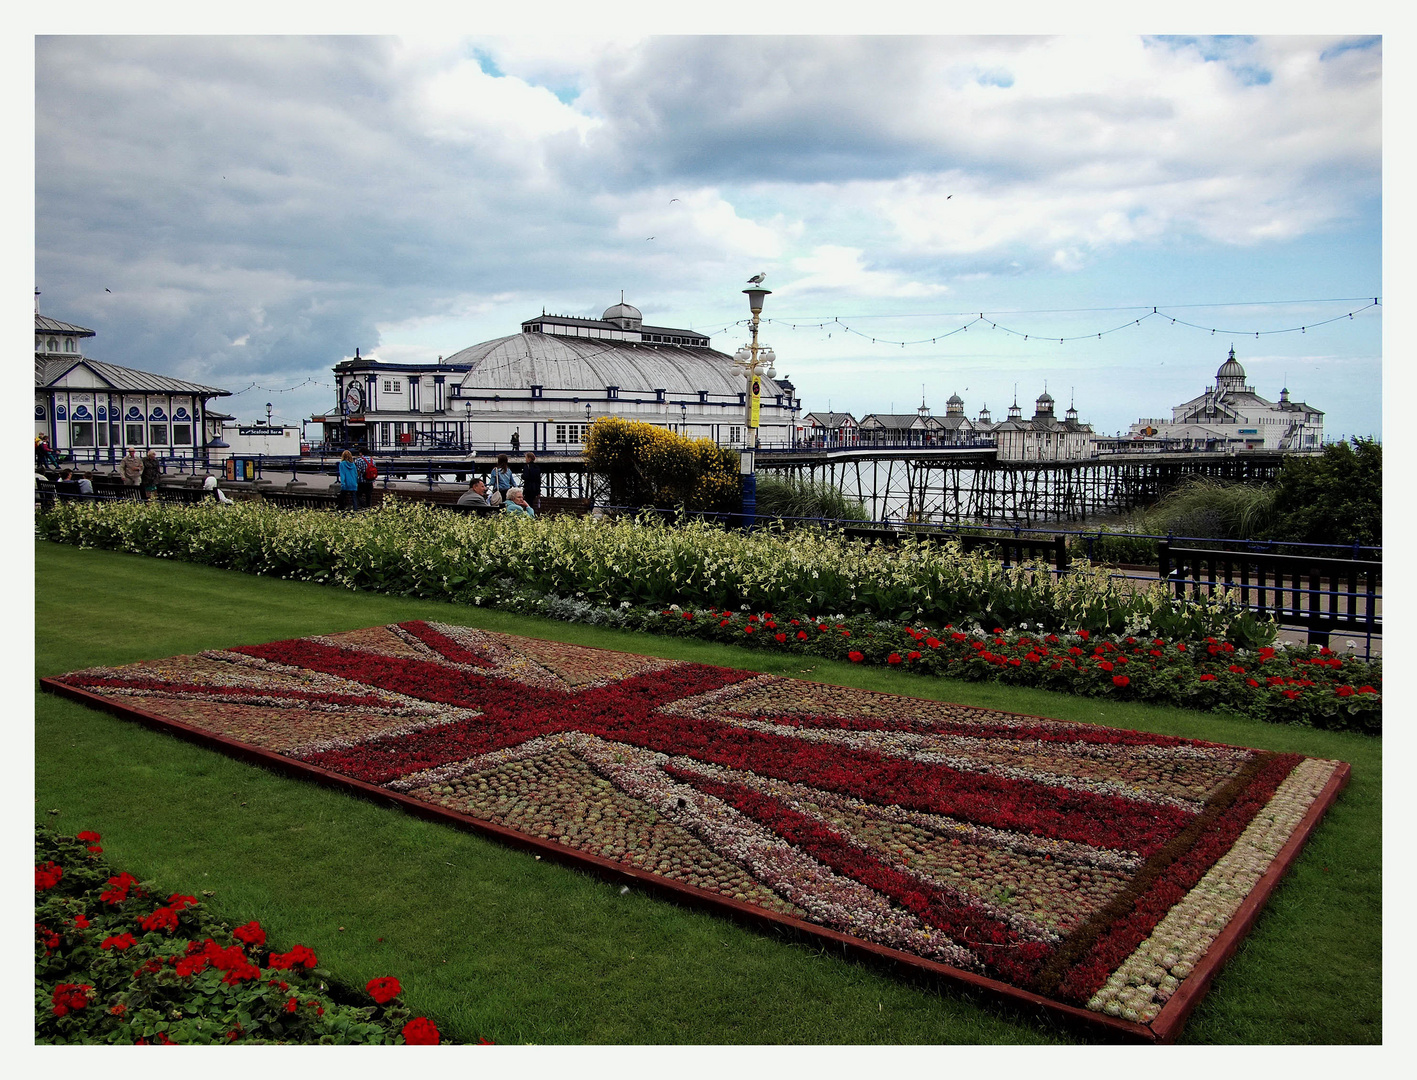 Union Jack at Eastbourne Pier